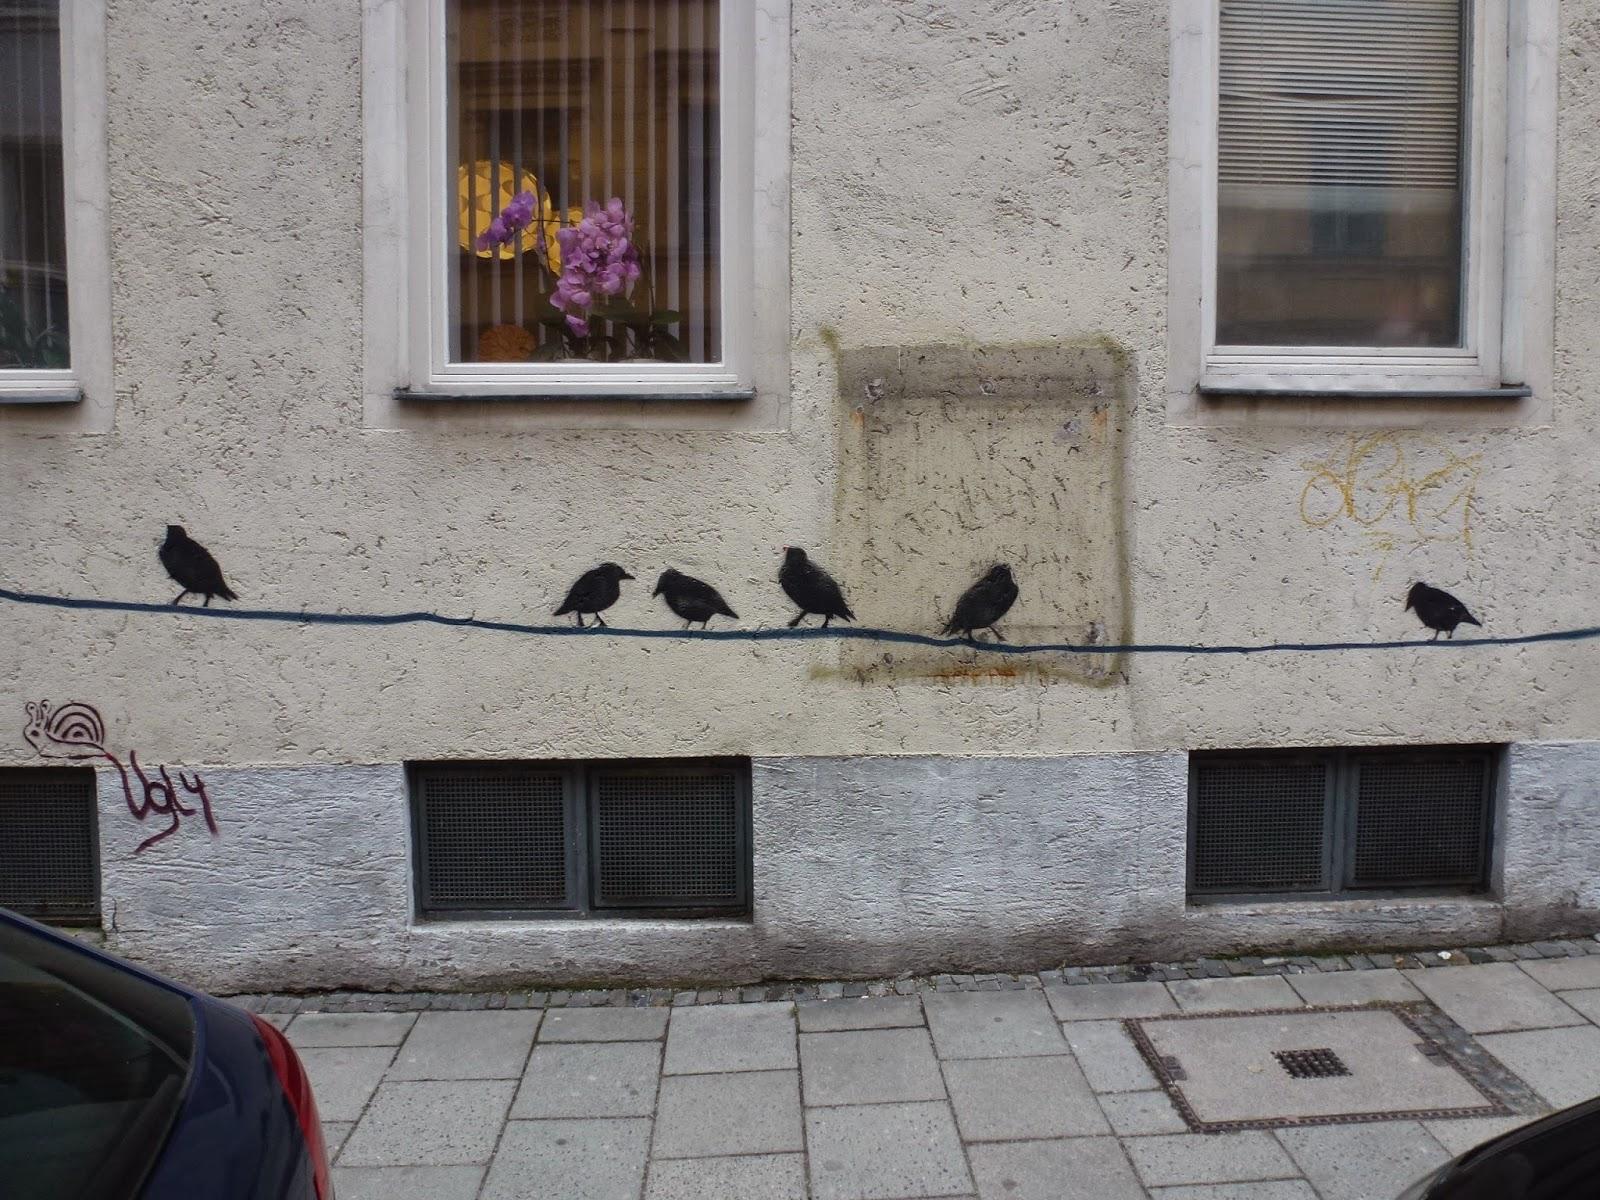 Streetart, Graffiti, Urbanart, Vögel, Silhouetten